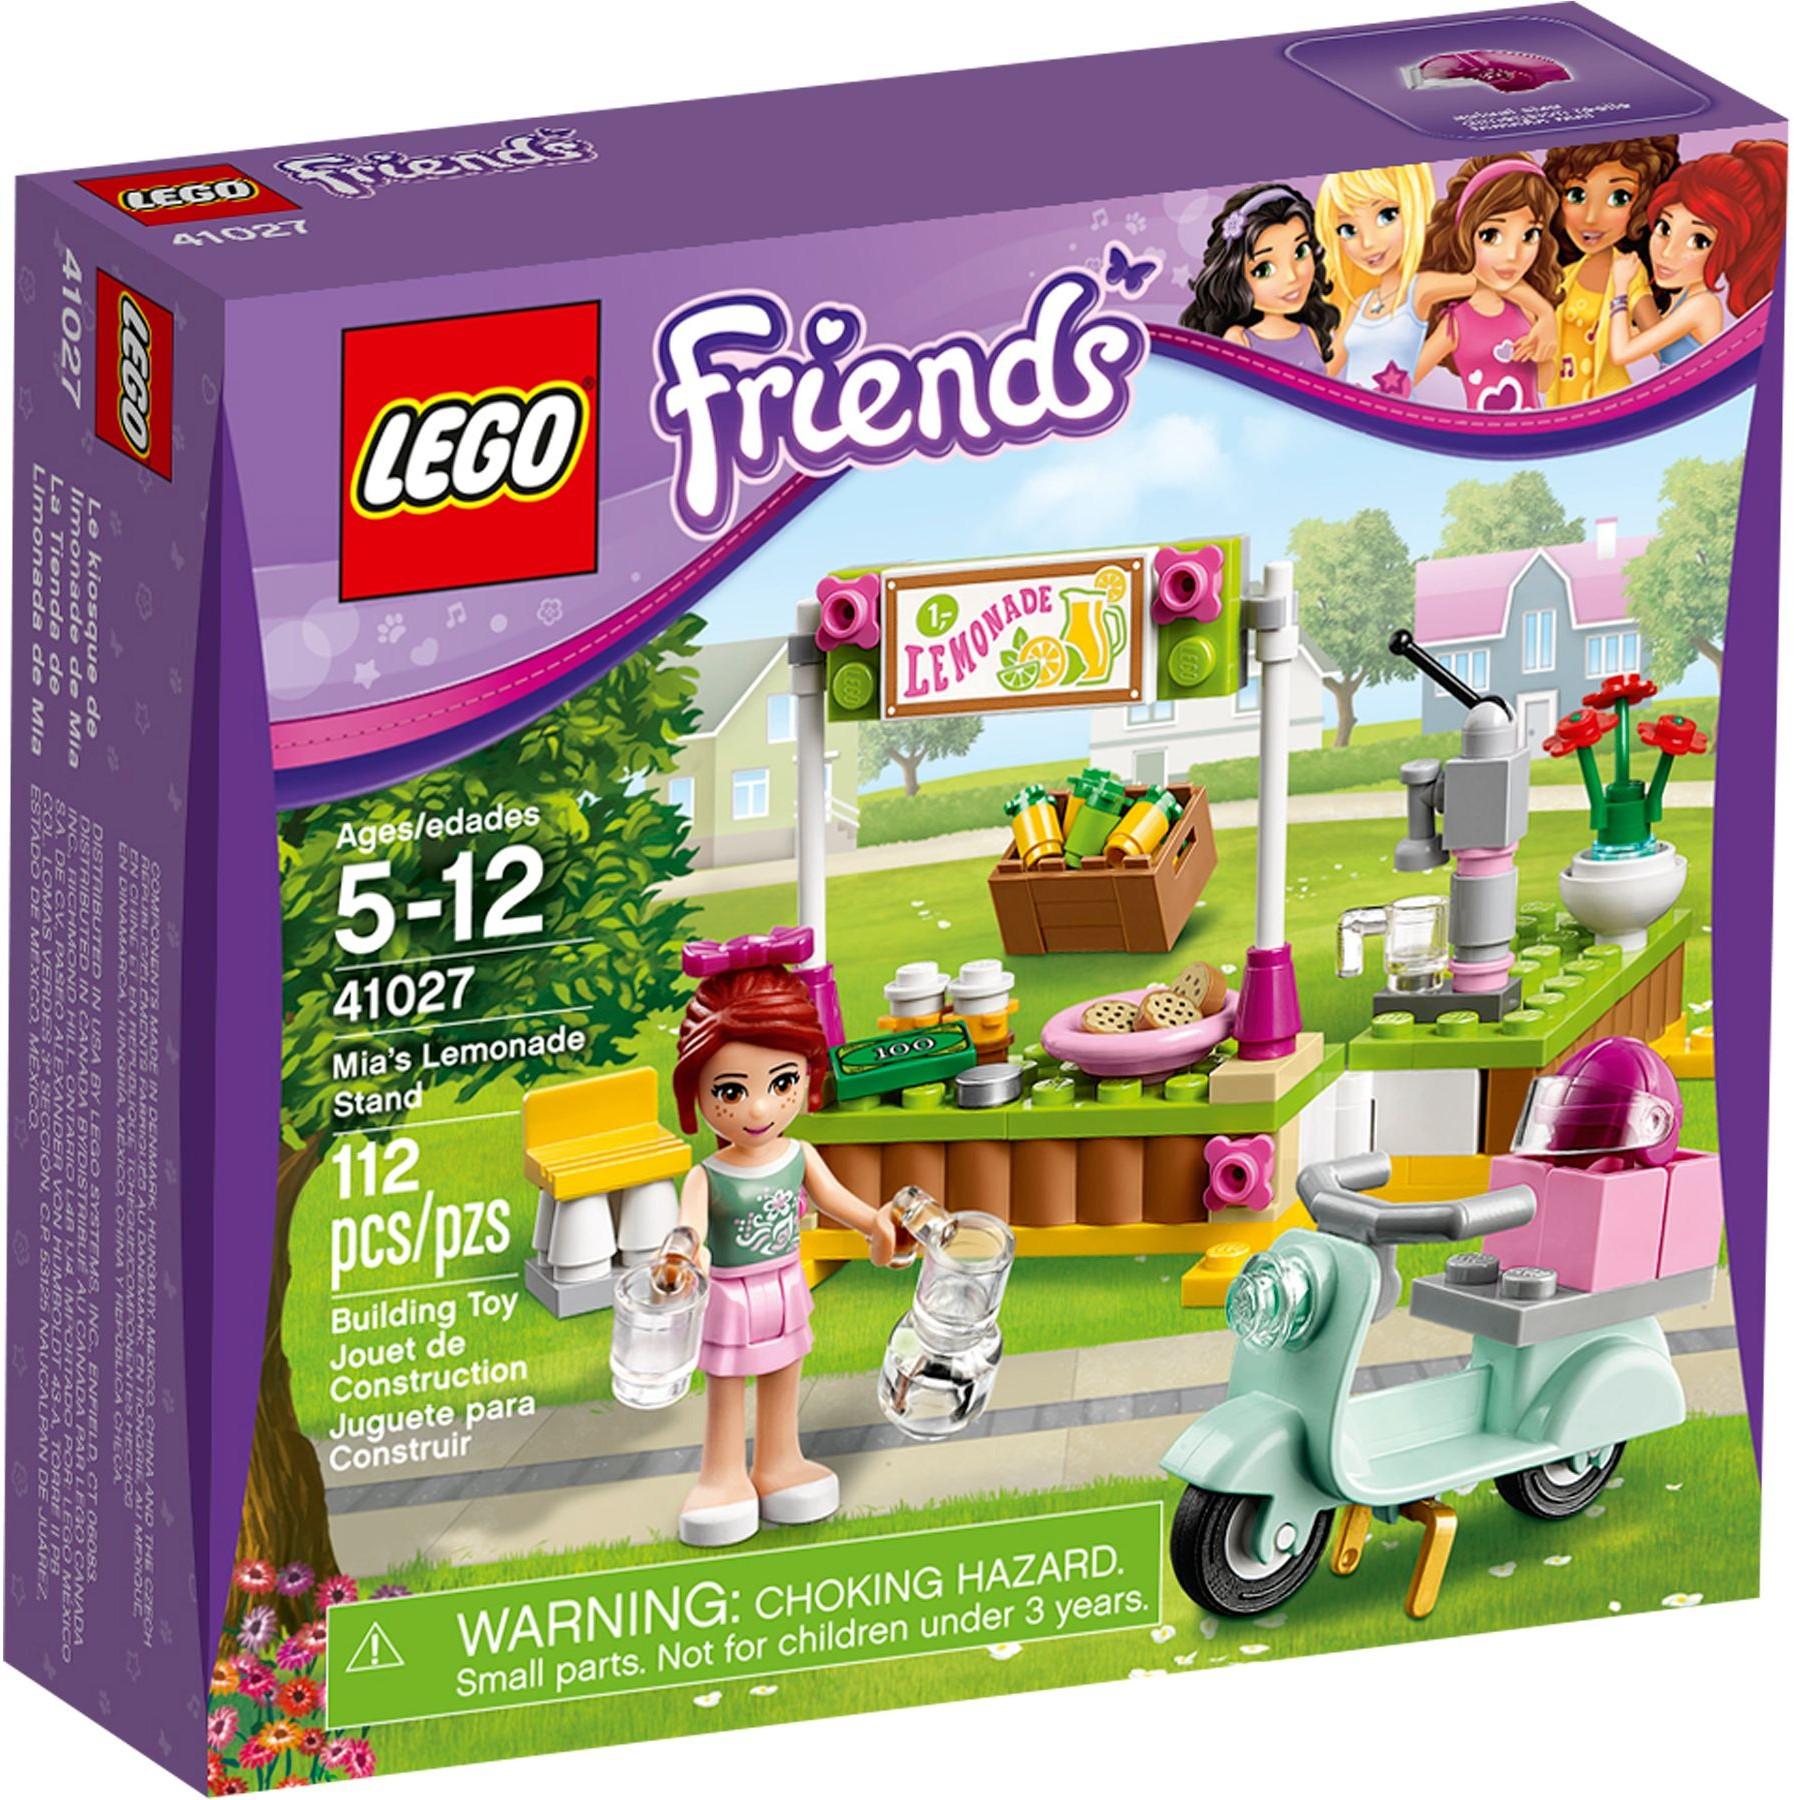 Mia S Lemonade Stand 41027 Lego Friends Wiki Fandom